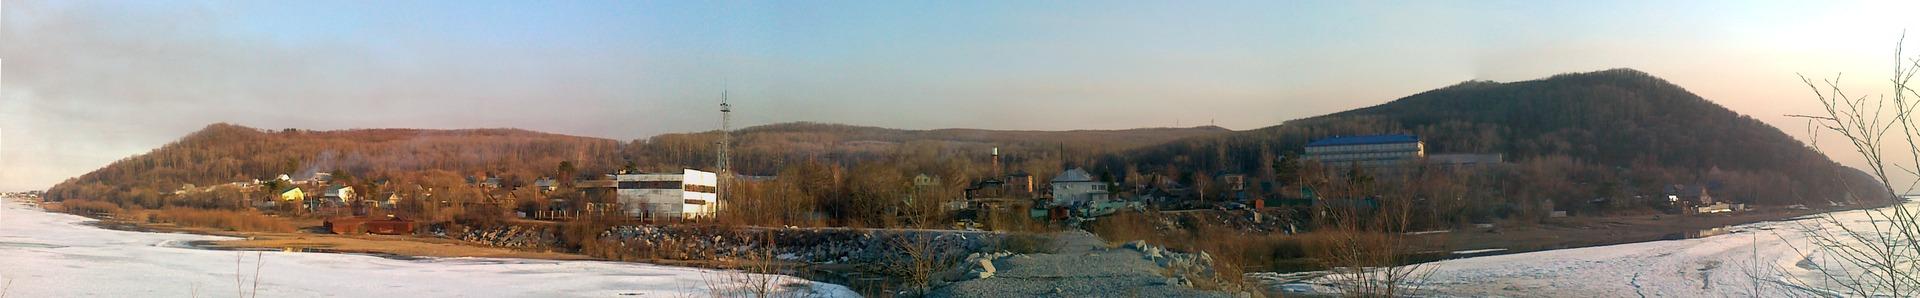 Село Воронежское-3